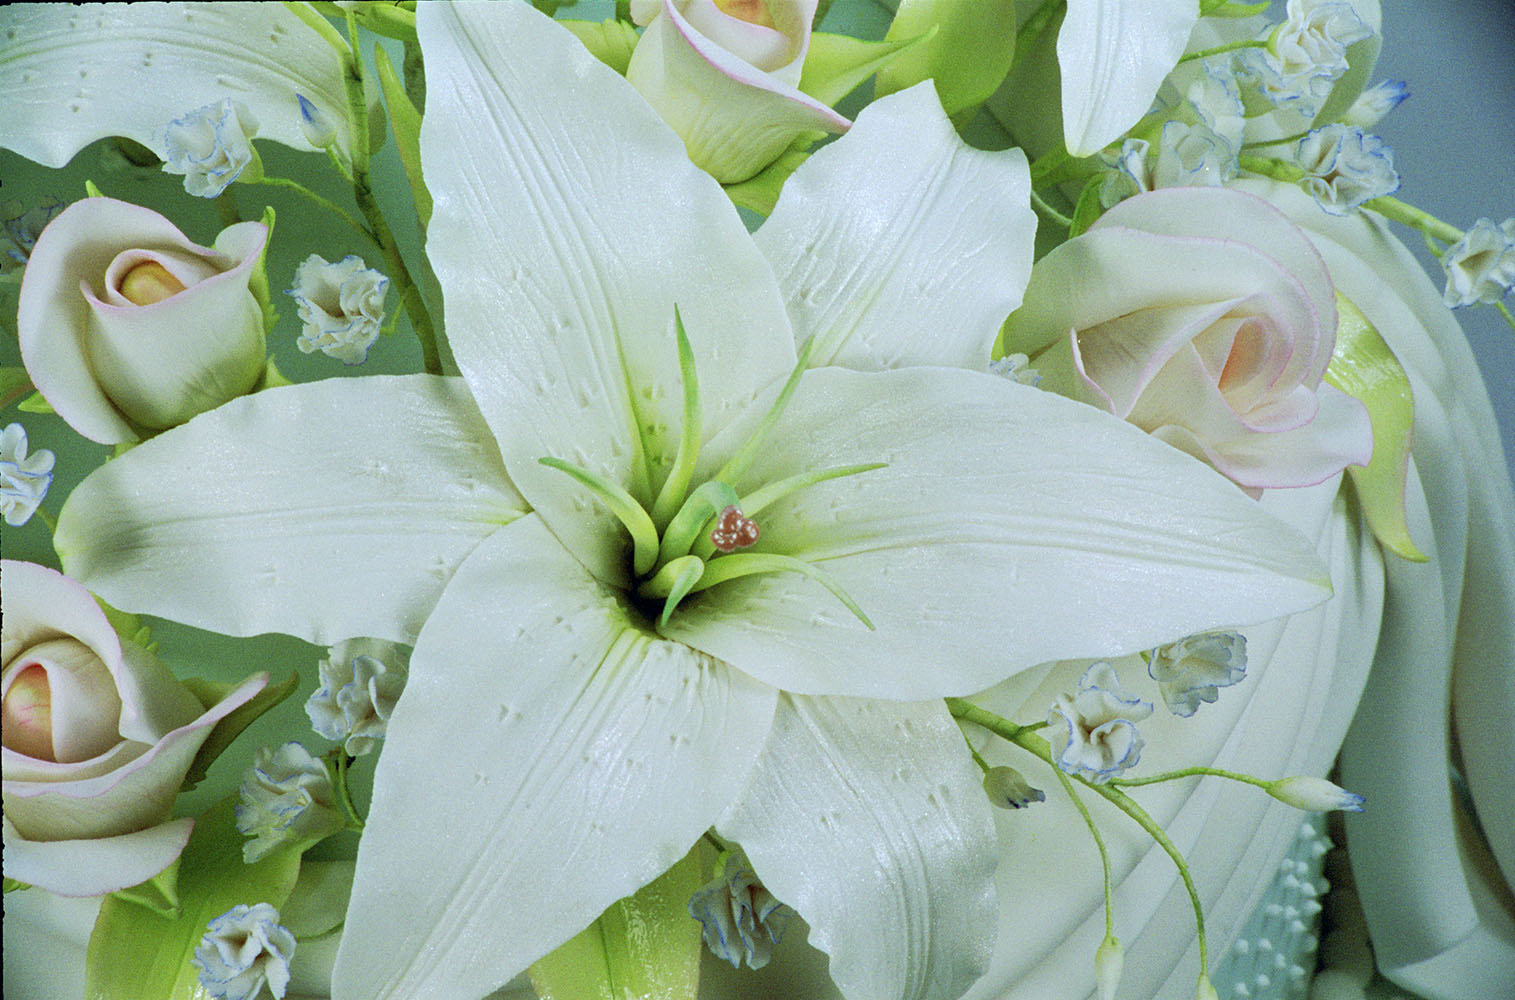 Casablanca lily petal world of sugar art sku v22 category flower petal and leaf veiners tags flowers veiners izmirmasajfo